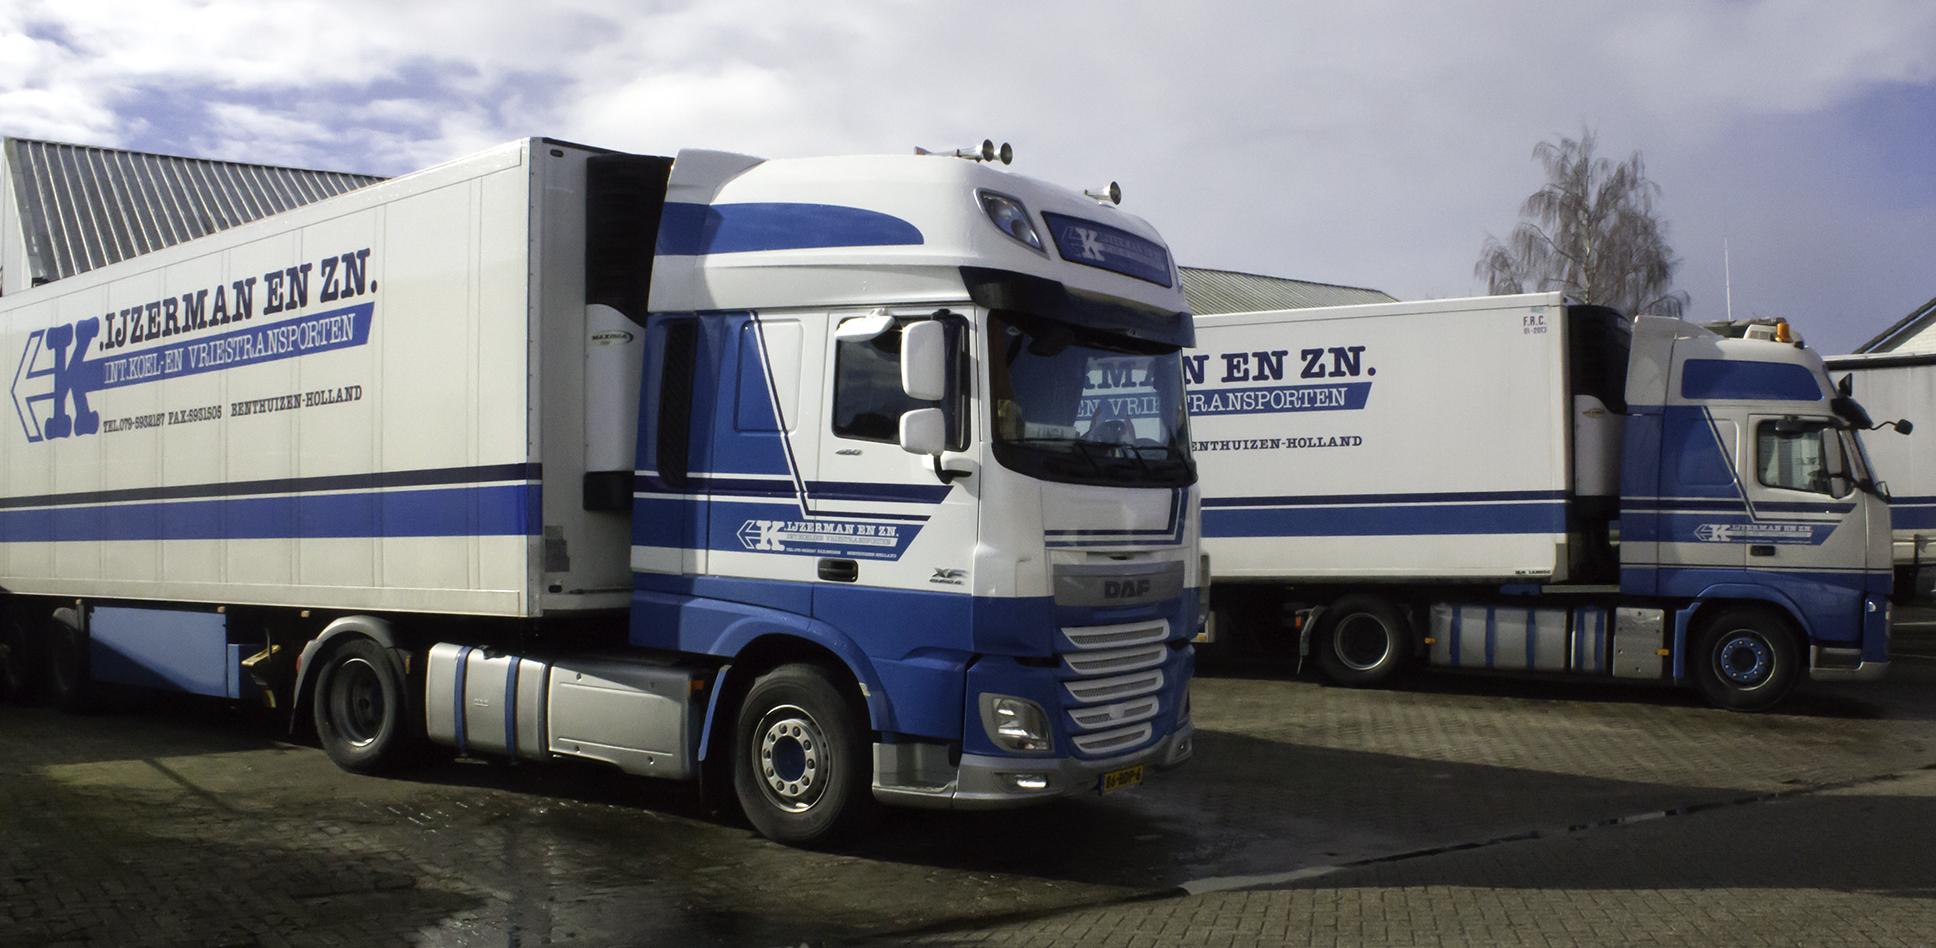 IJzerman transport